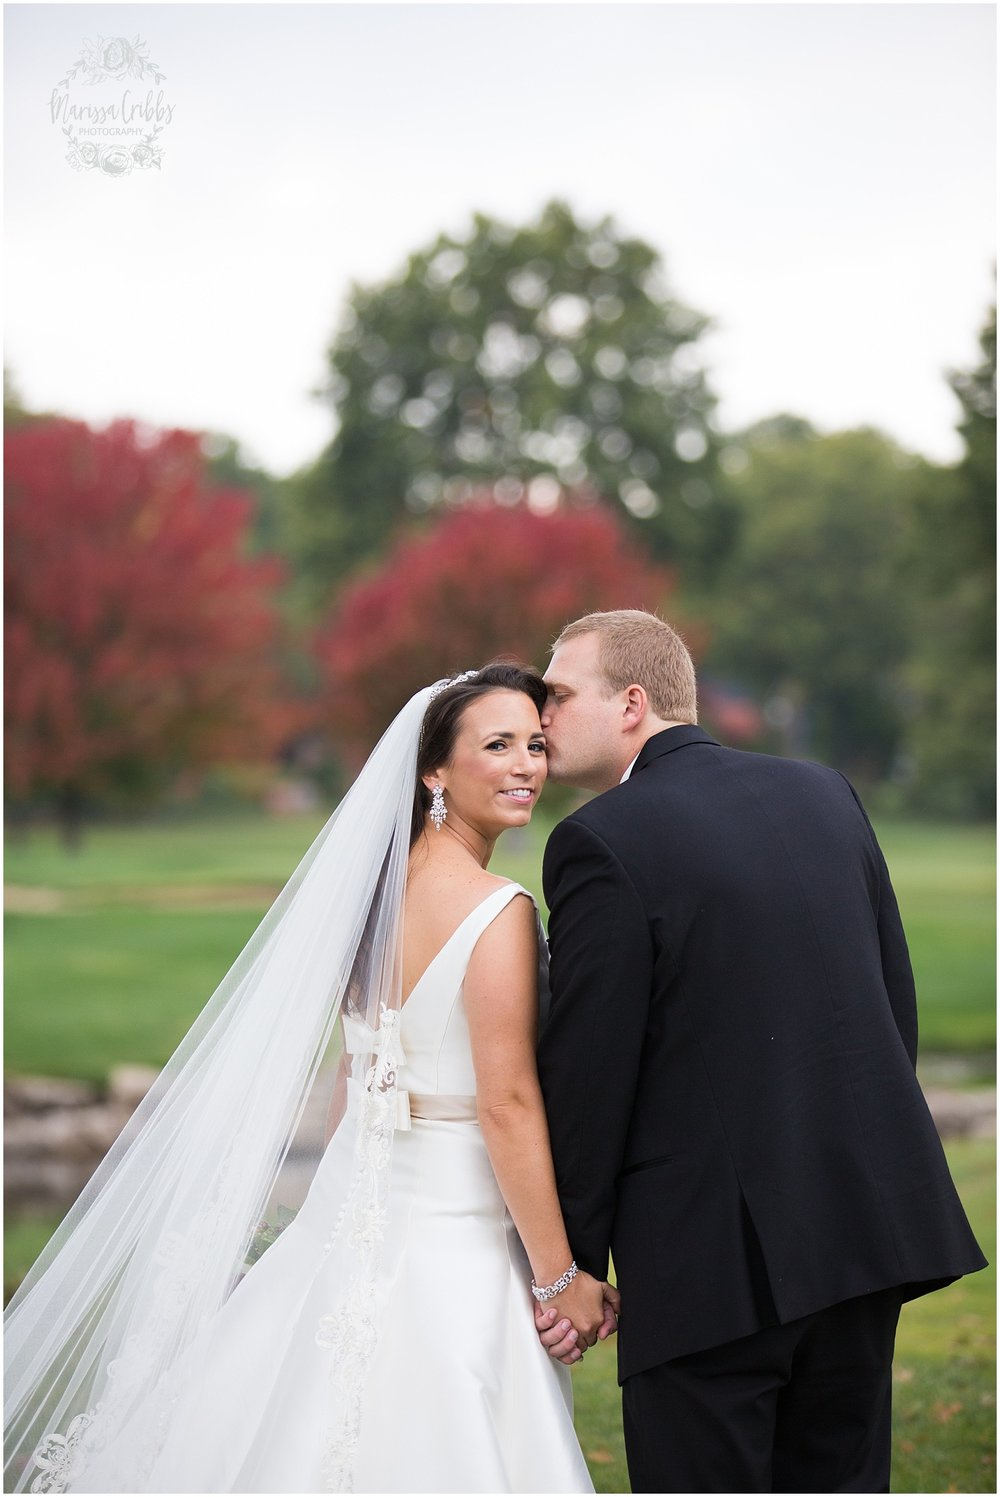 Blue Hills Country Club Wedding | Marissa Cribbs Photography | Nolte's Bridal | KC Wedding Photographer | KC Weddings_1180.jpg